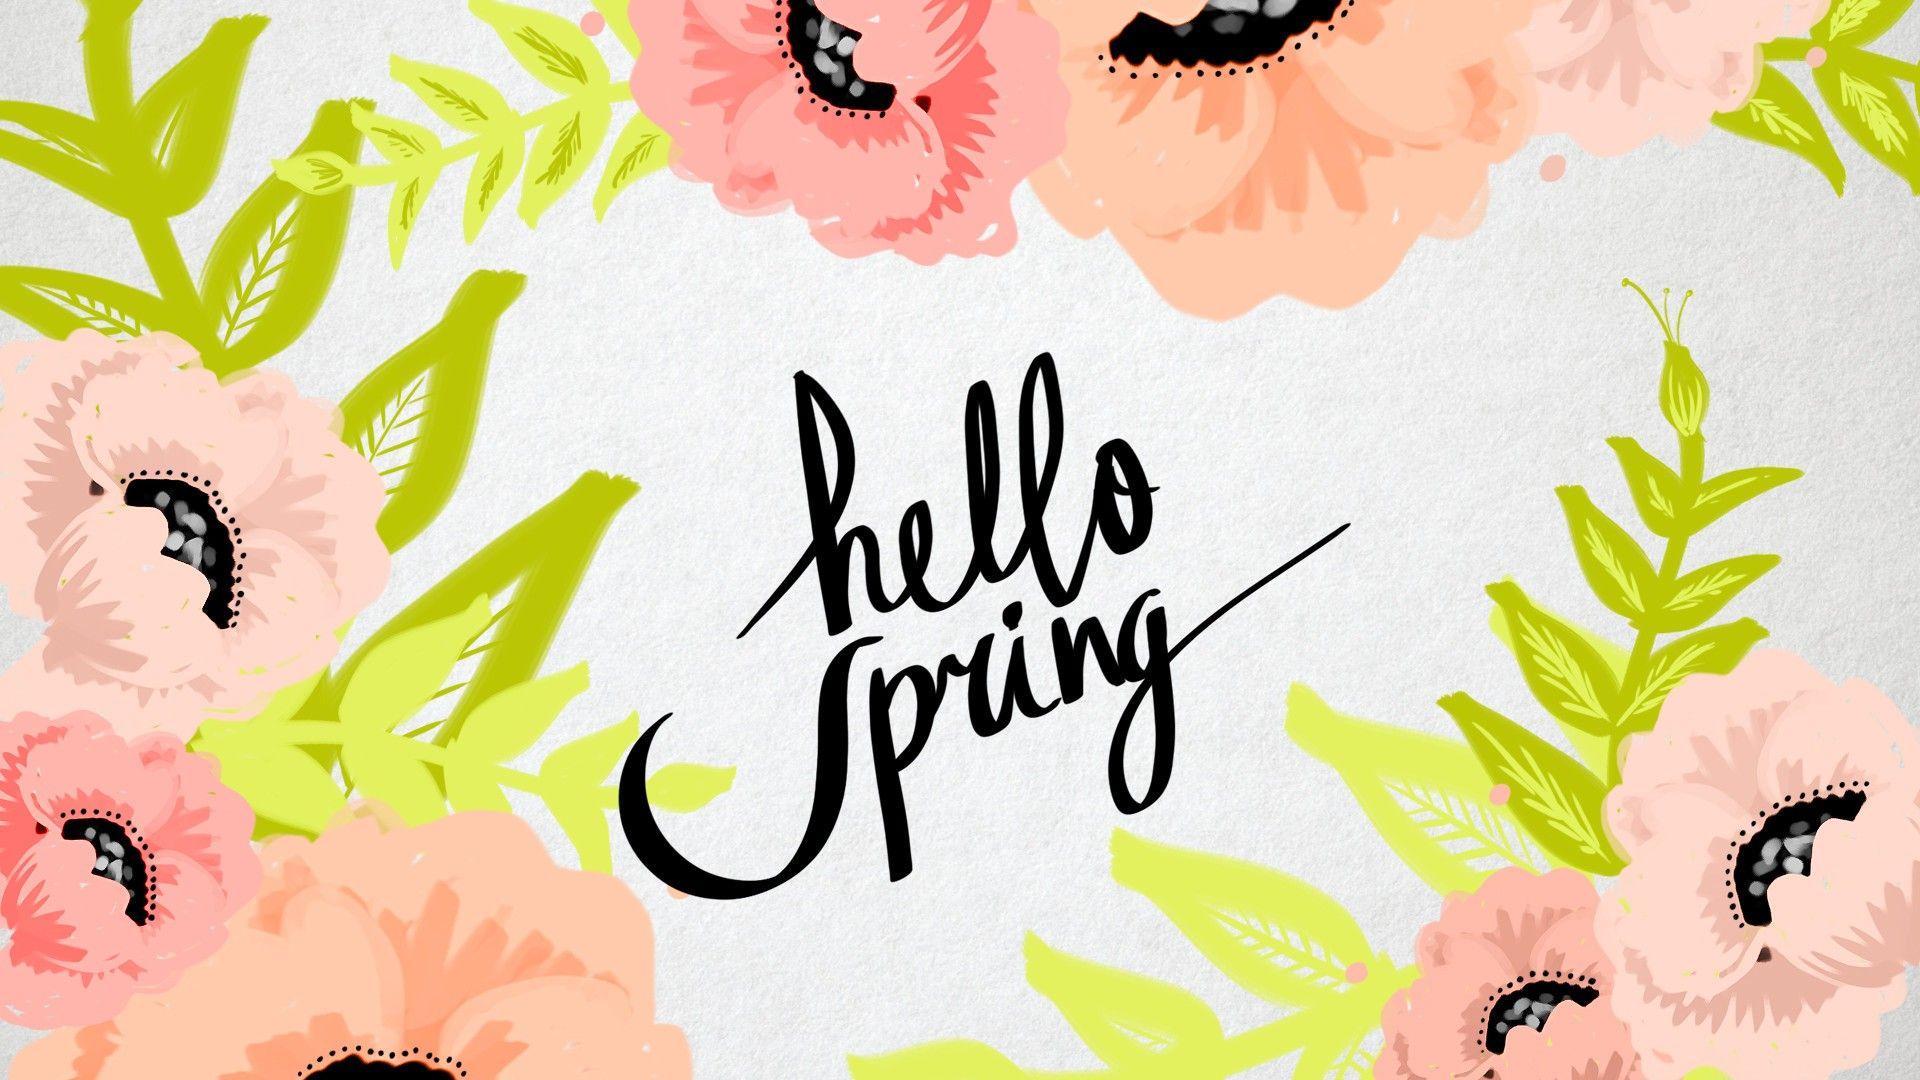 Wallpaper Hello Spring Hello spring wallpaper, Spring